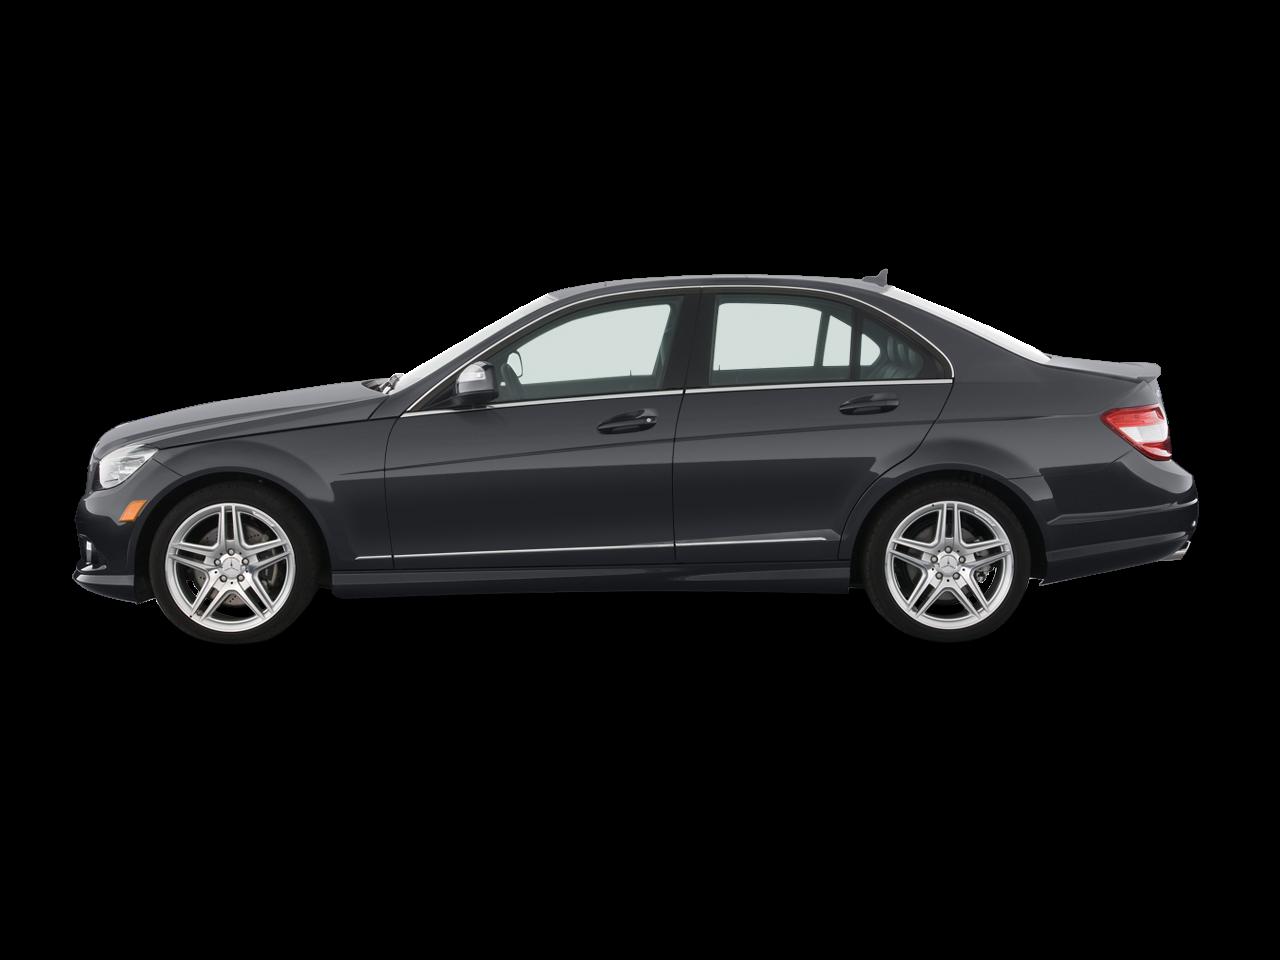 2009 Mercedes Benz C300 4Matic - Mercedes Benz Luxury ...